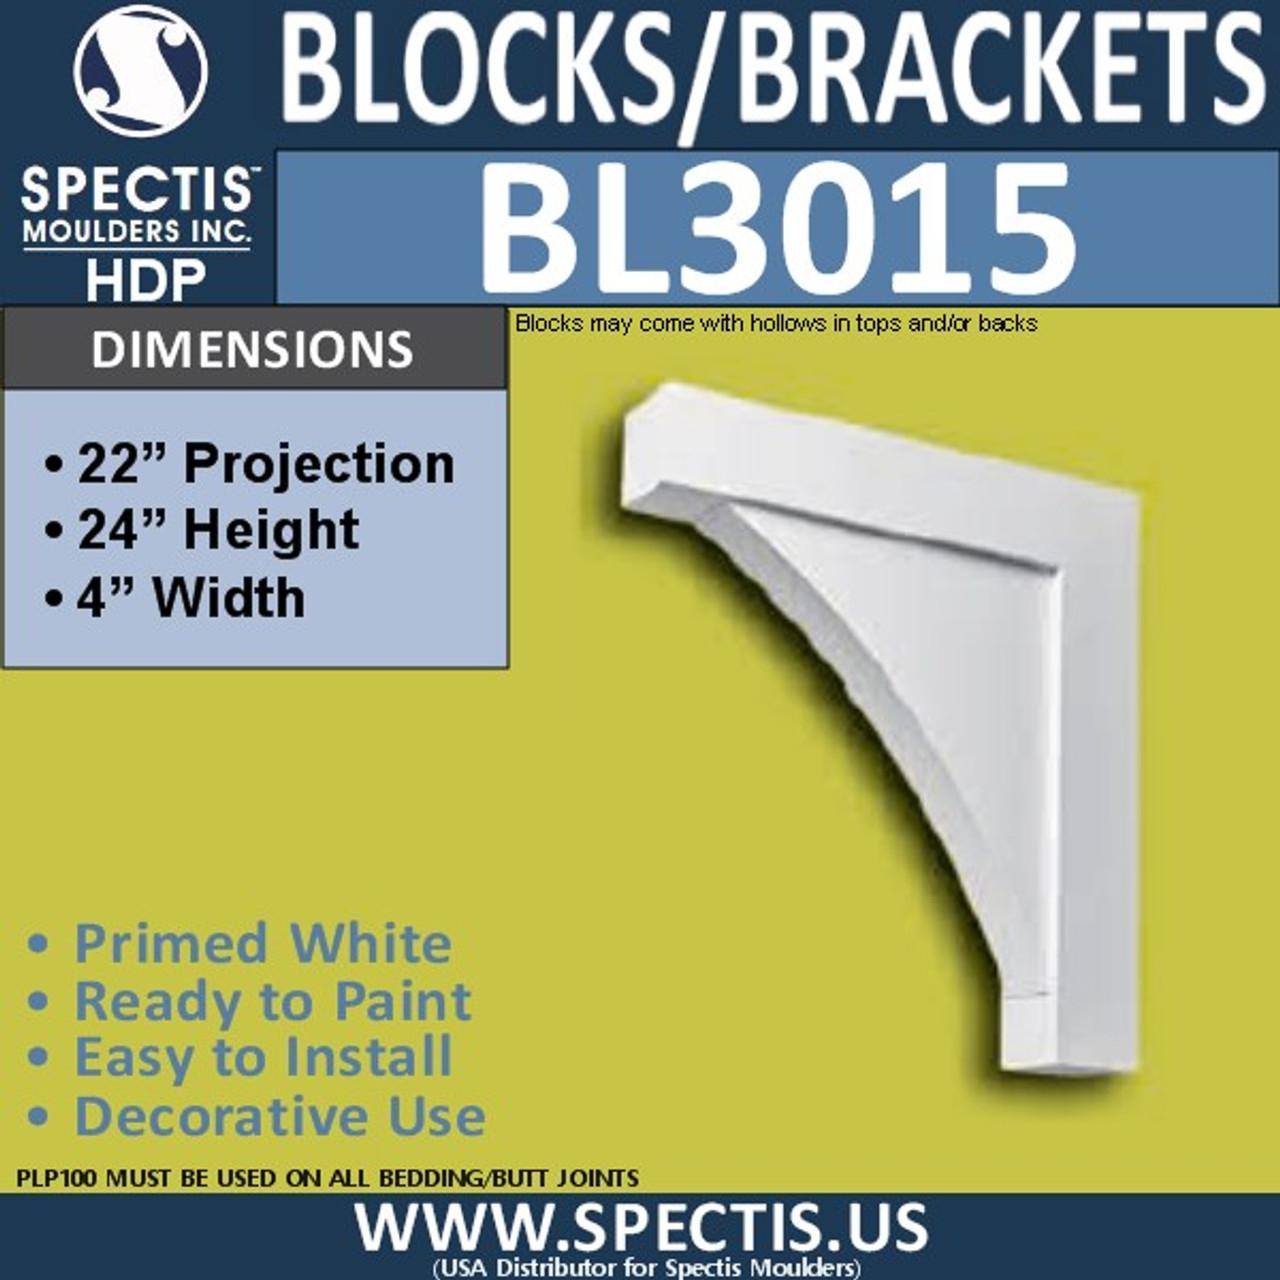 "BL3015 Eave Block or Bracket 4""W x 24""H x 22"" P"